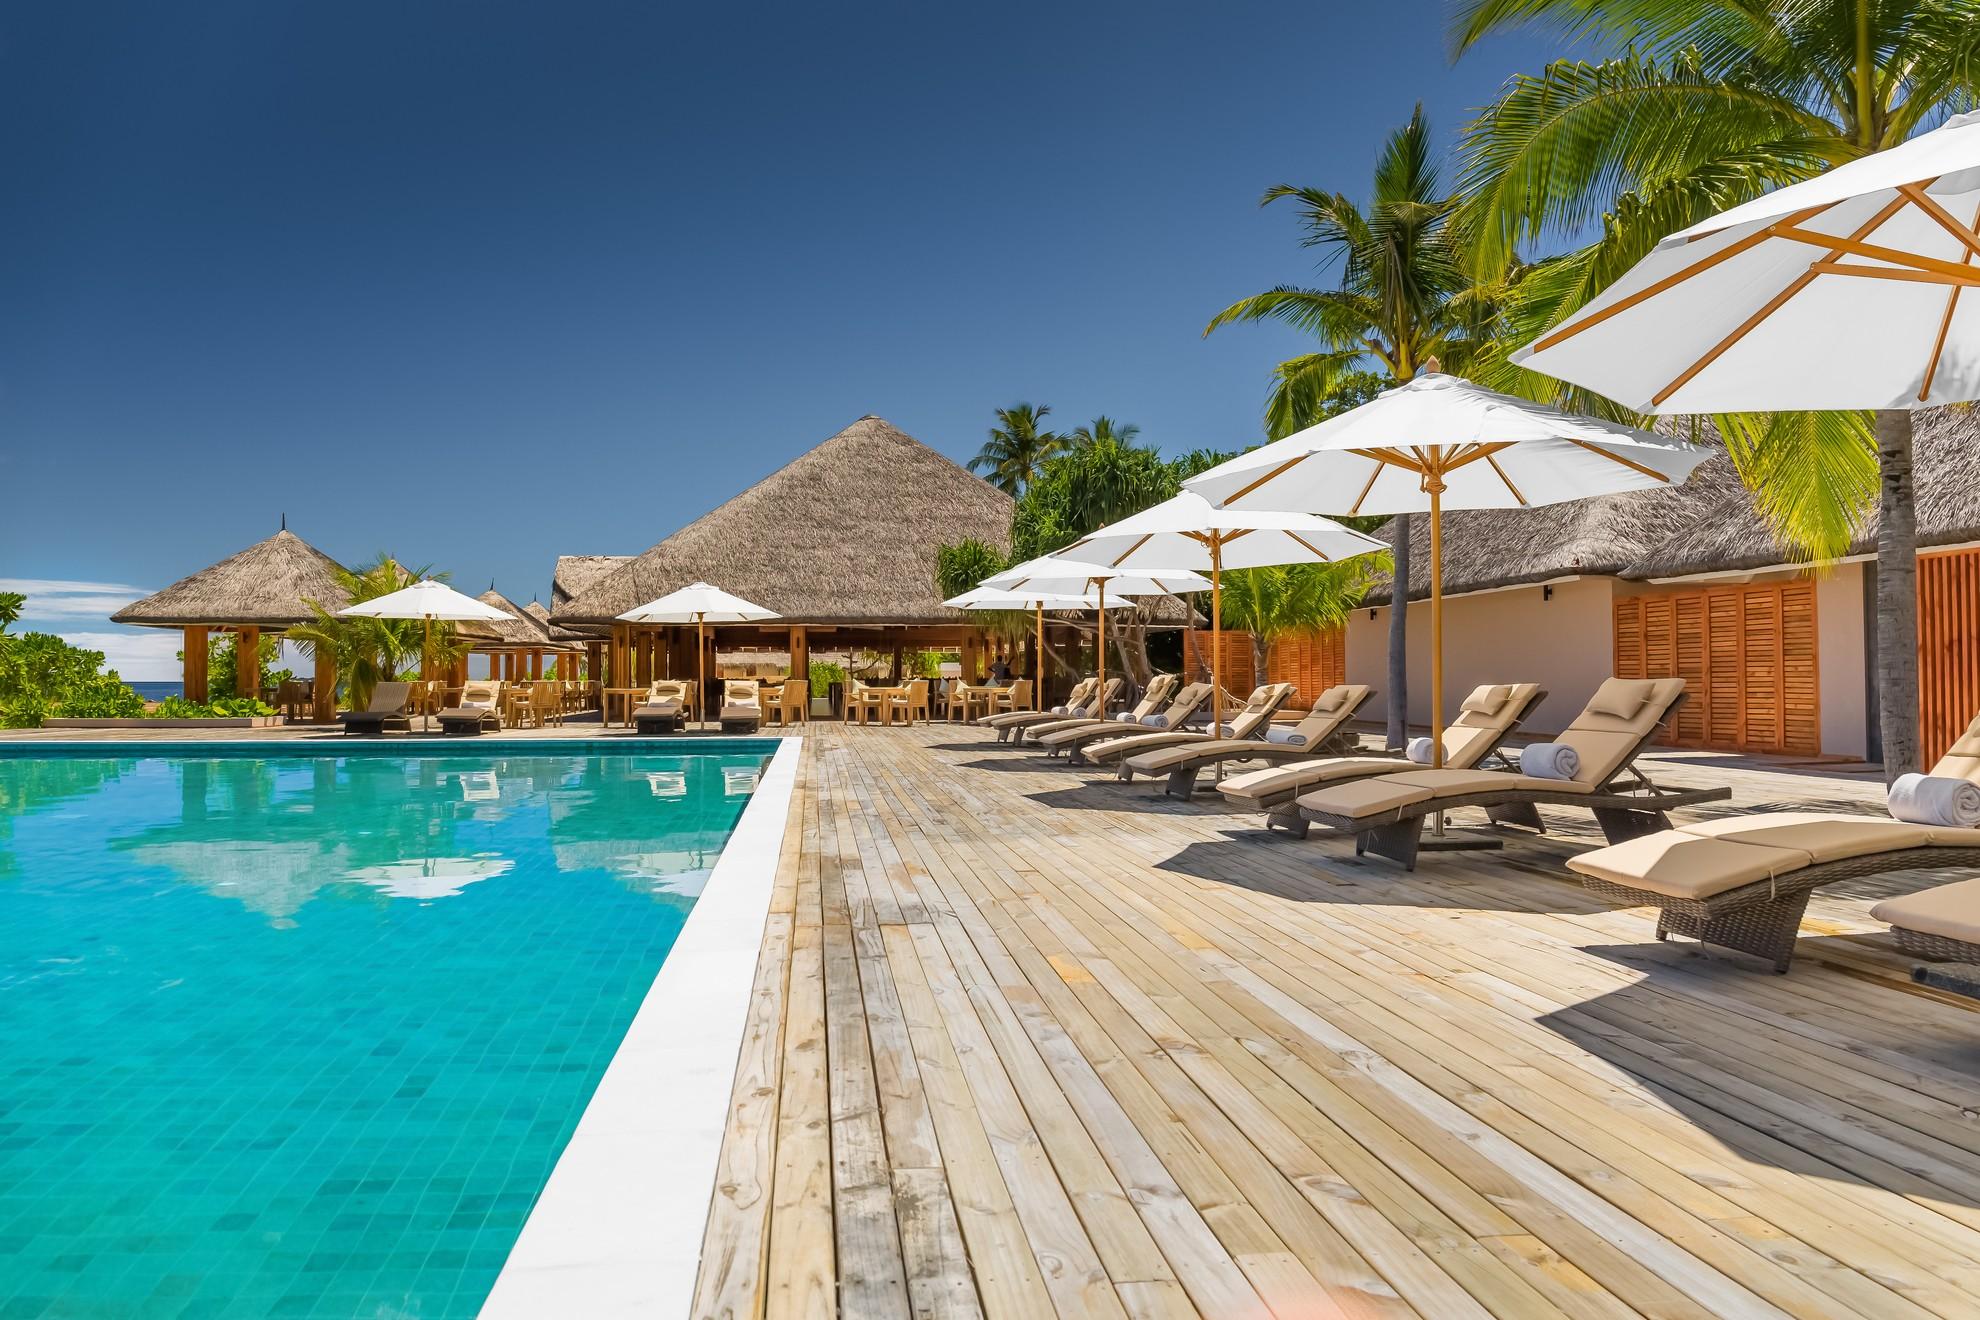 Star Hotel In Maldives